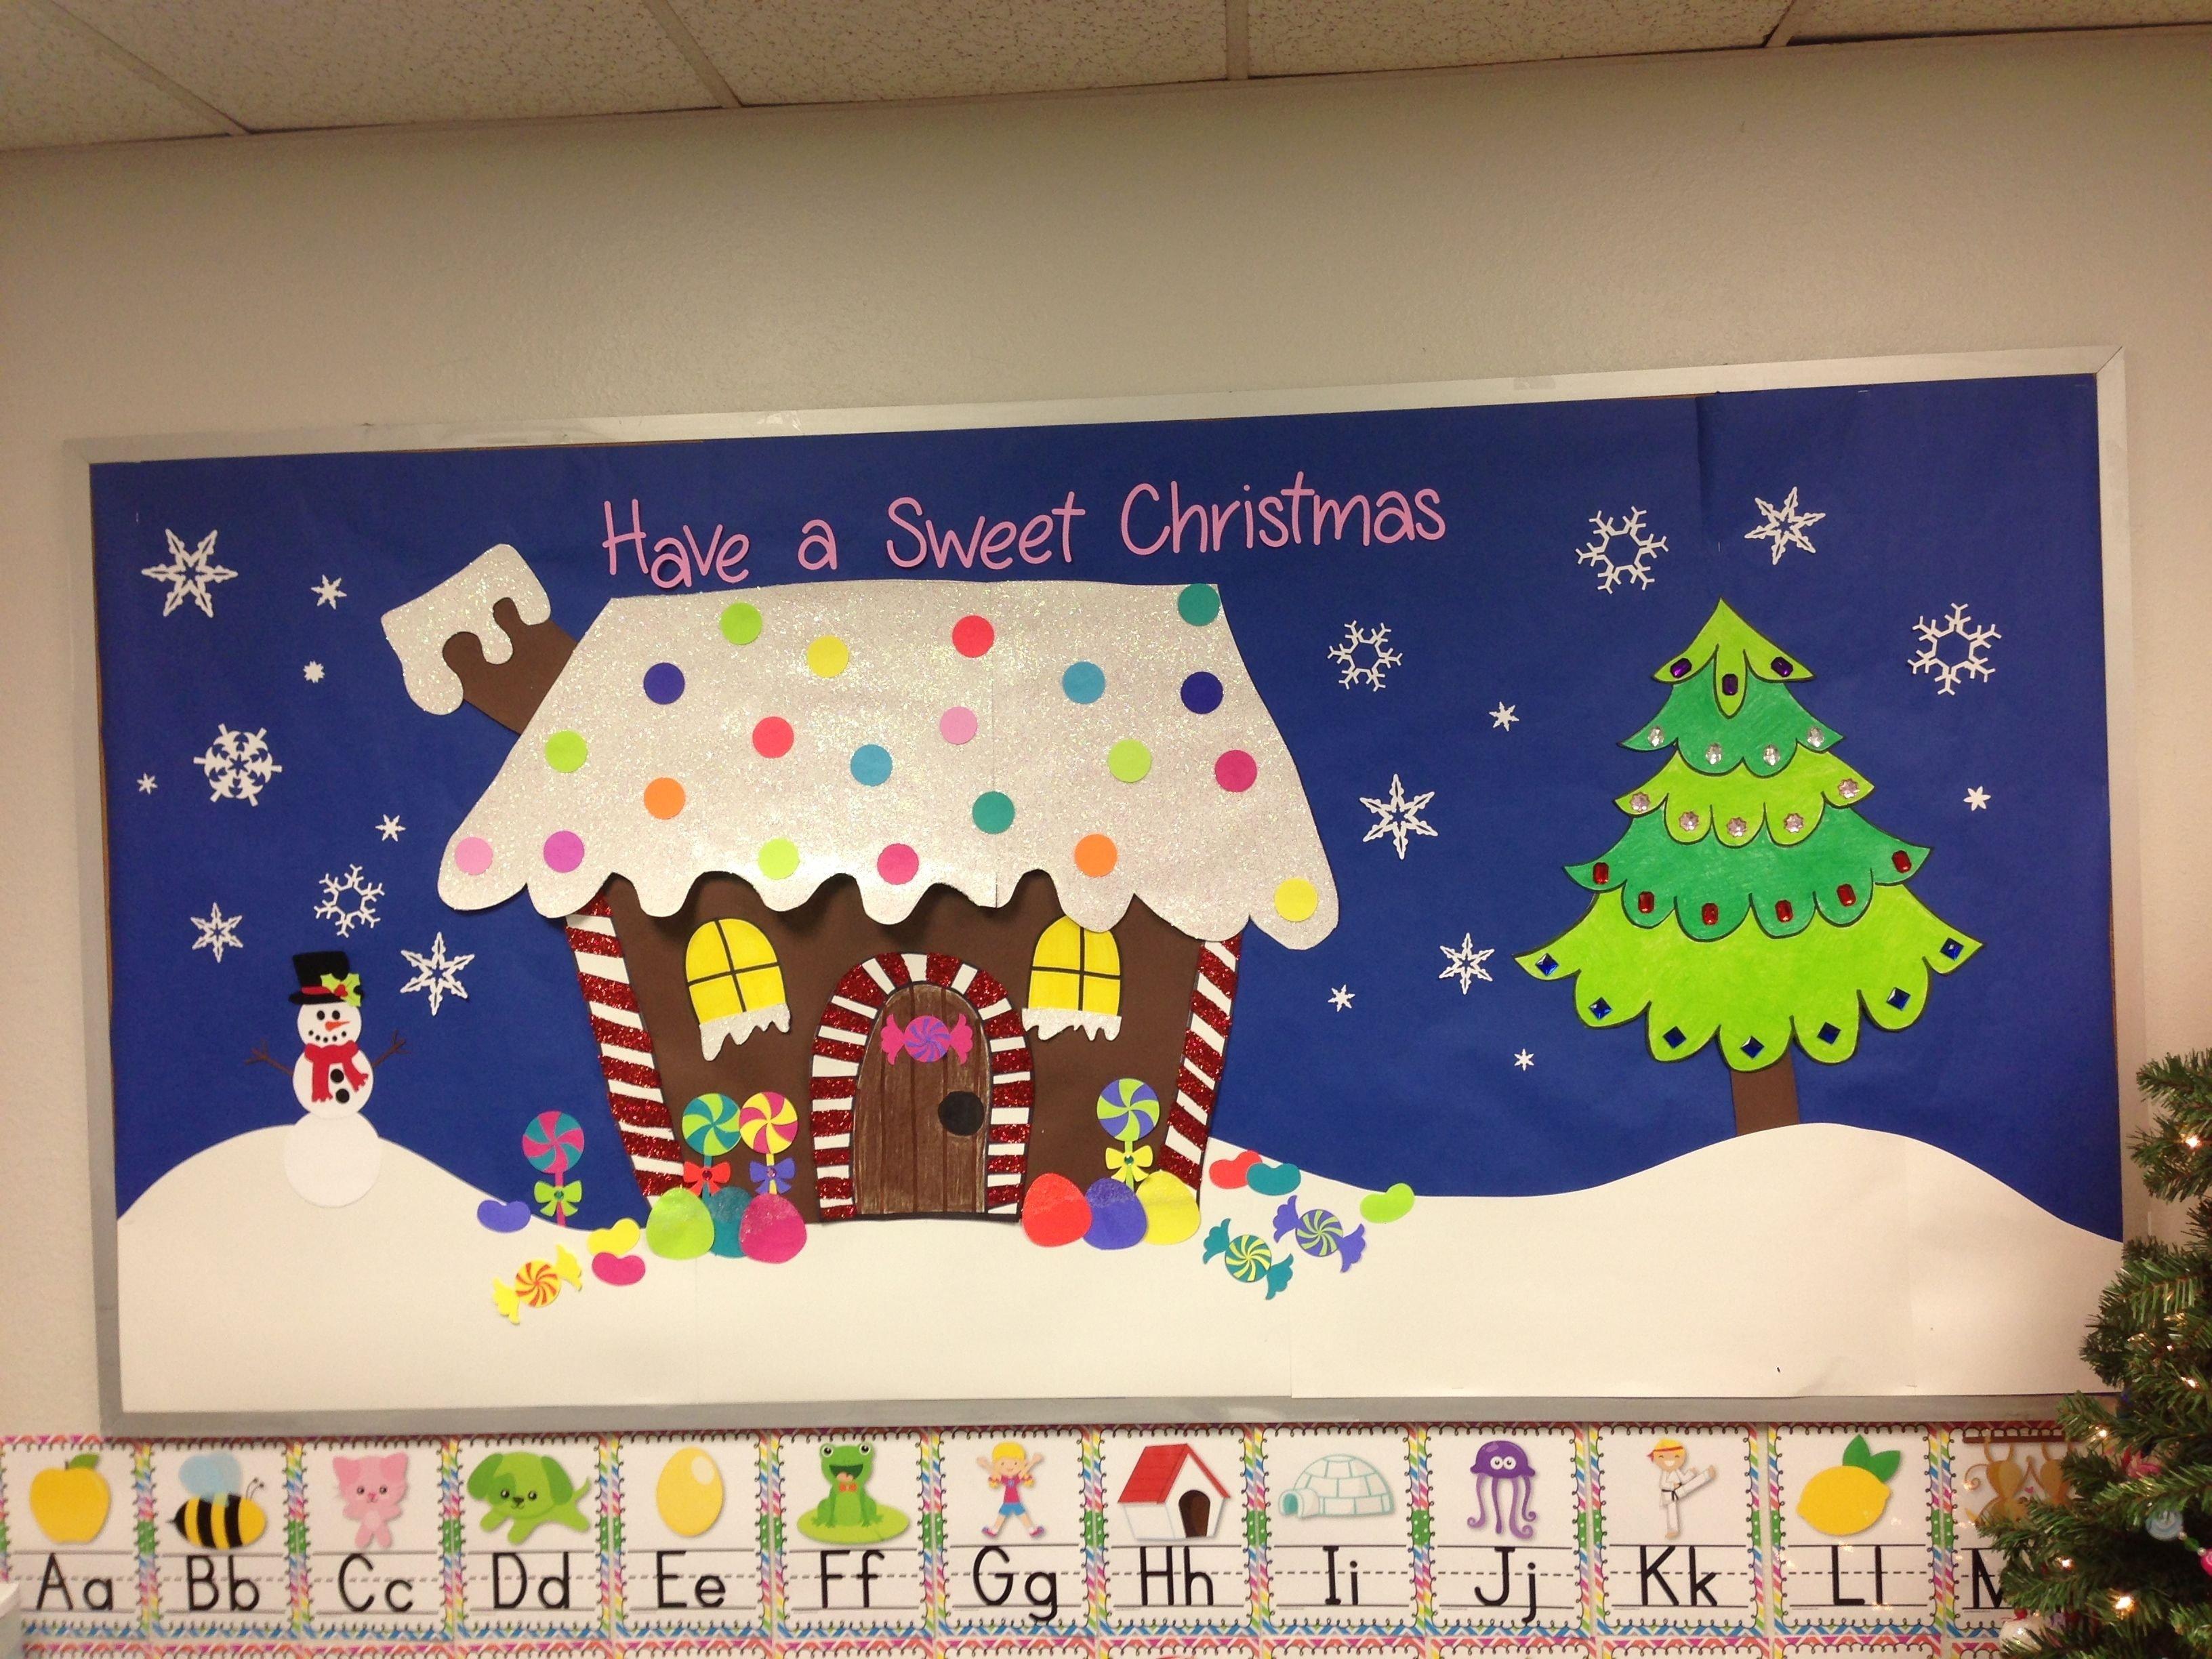 10 Gorgeous Winter Wonderland Bulletin Board Ideas christmas bulletin board gingerbread house bulletin boards 1 2021